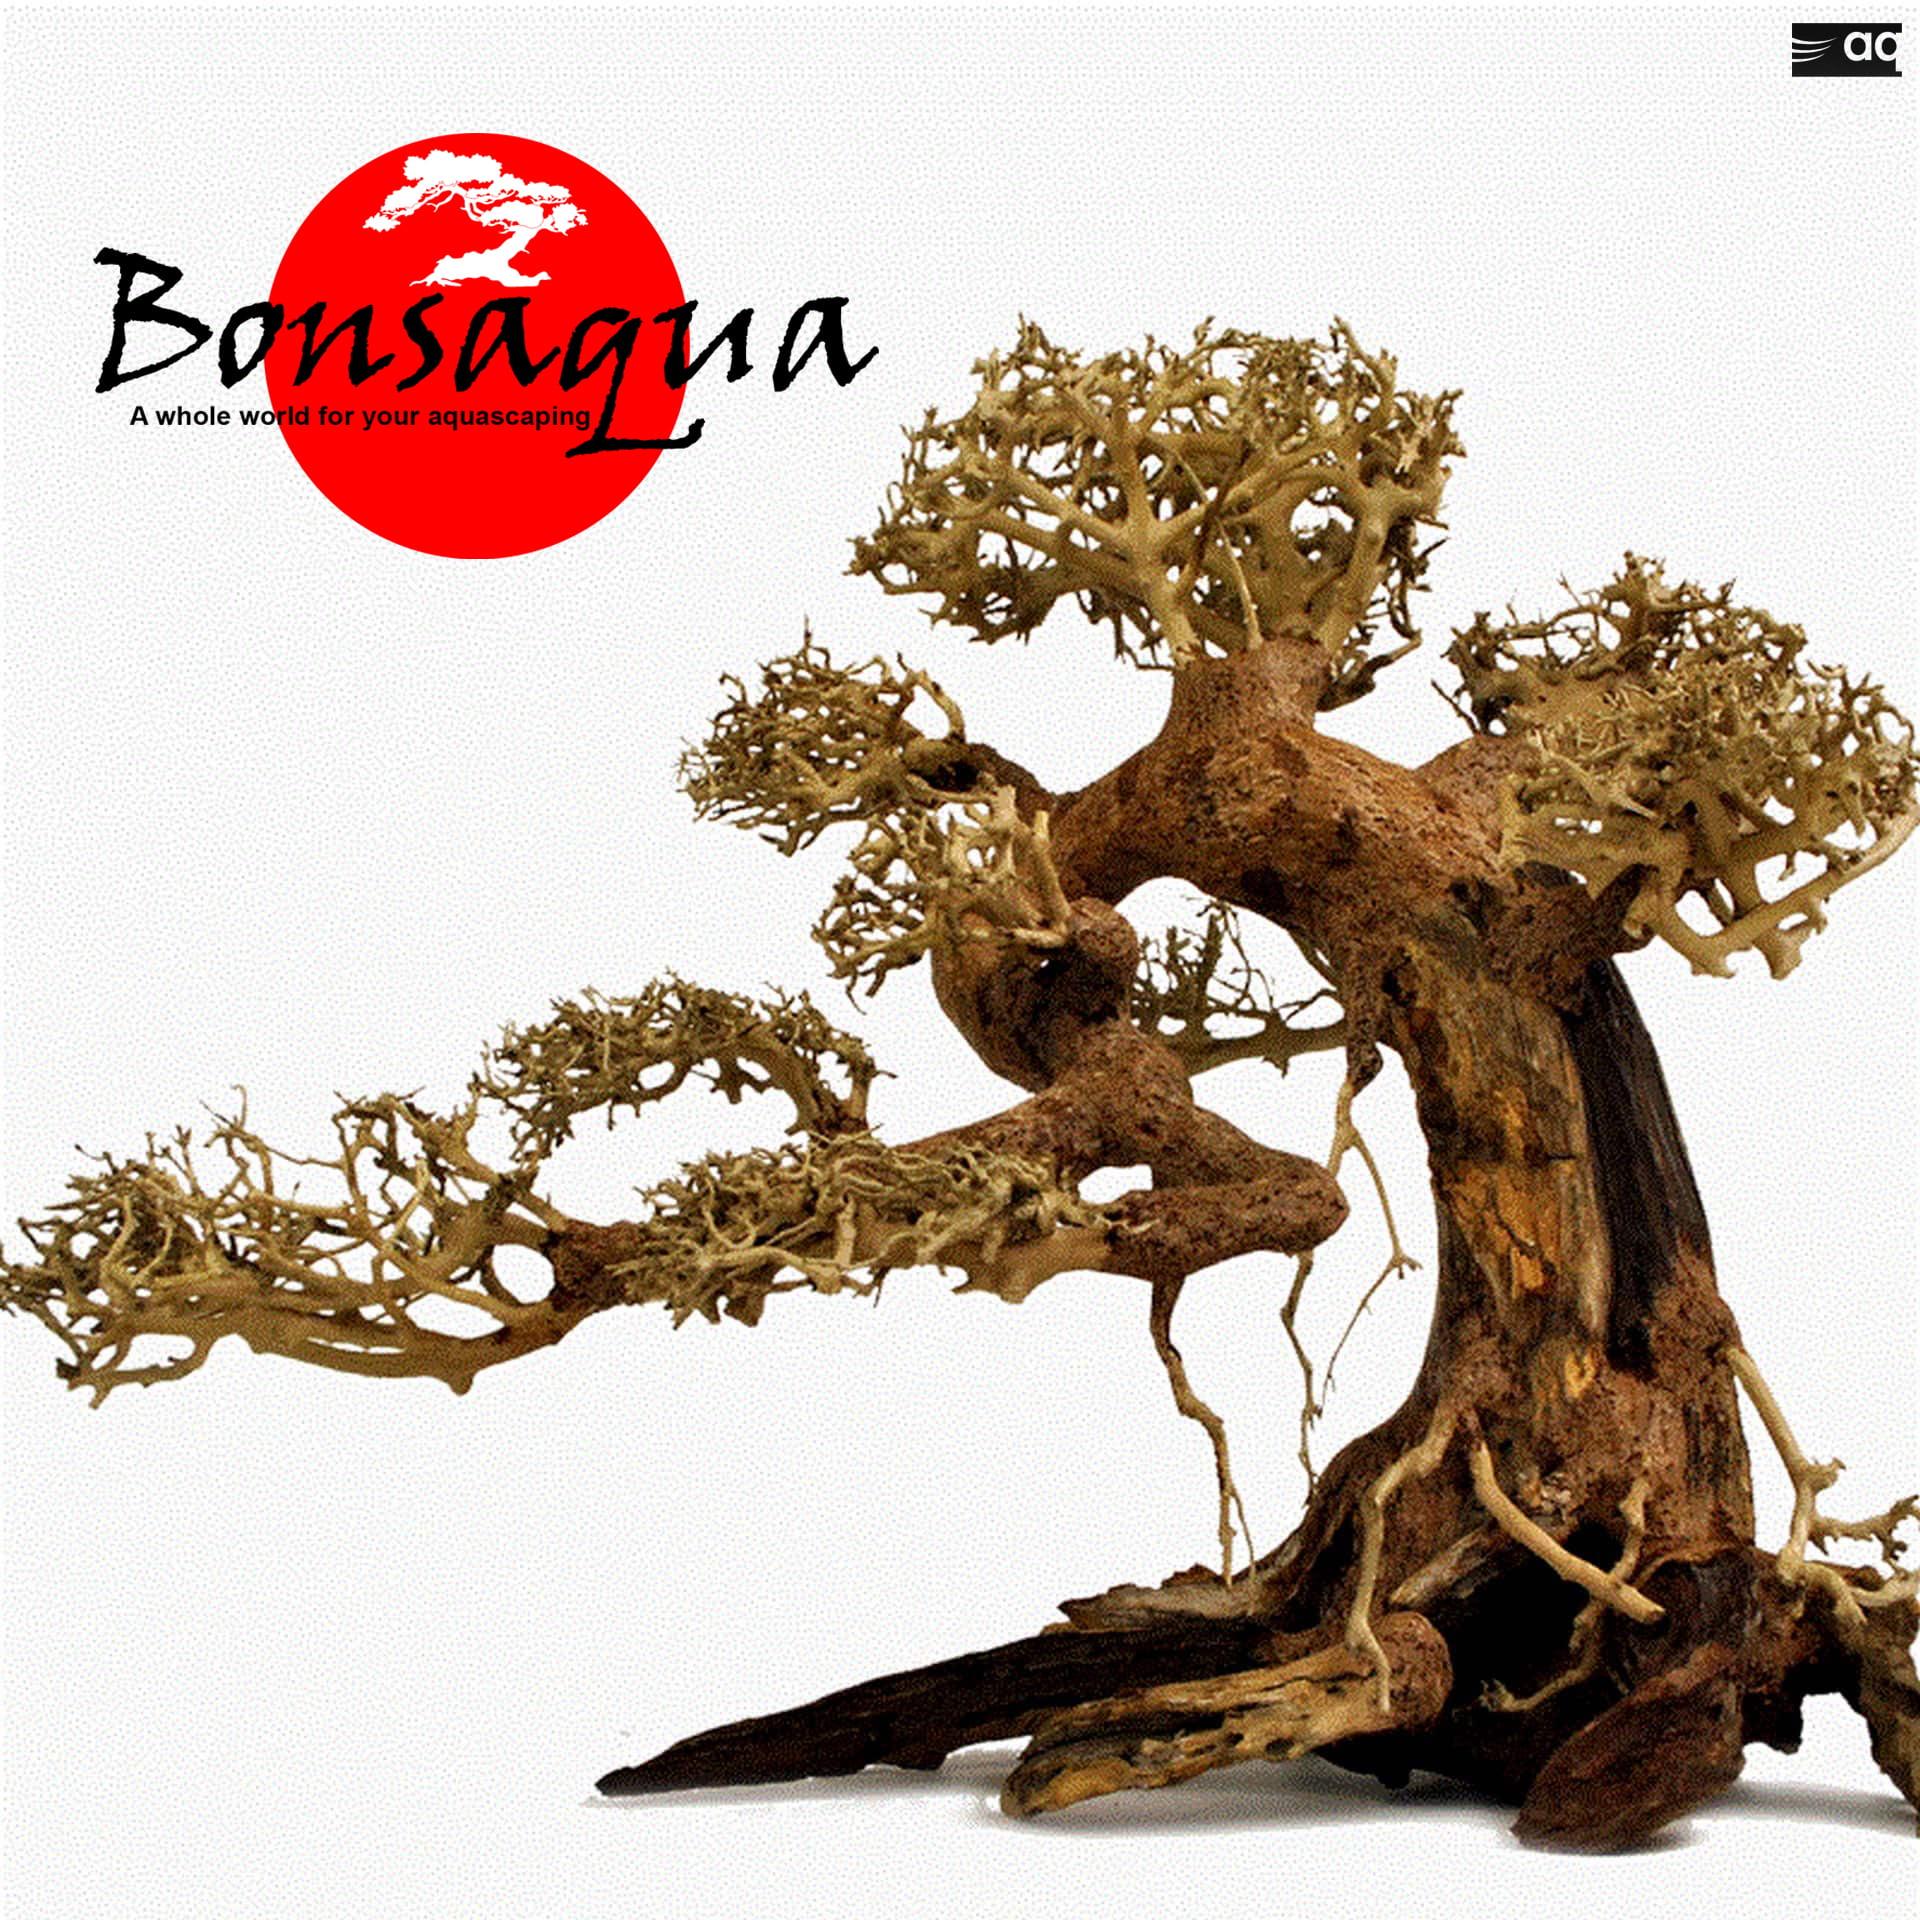 Bonsai Bonsaqua